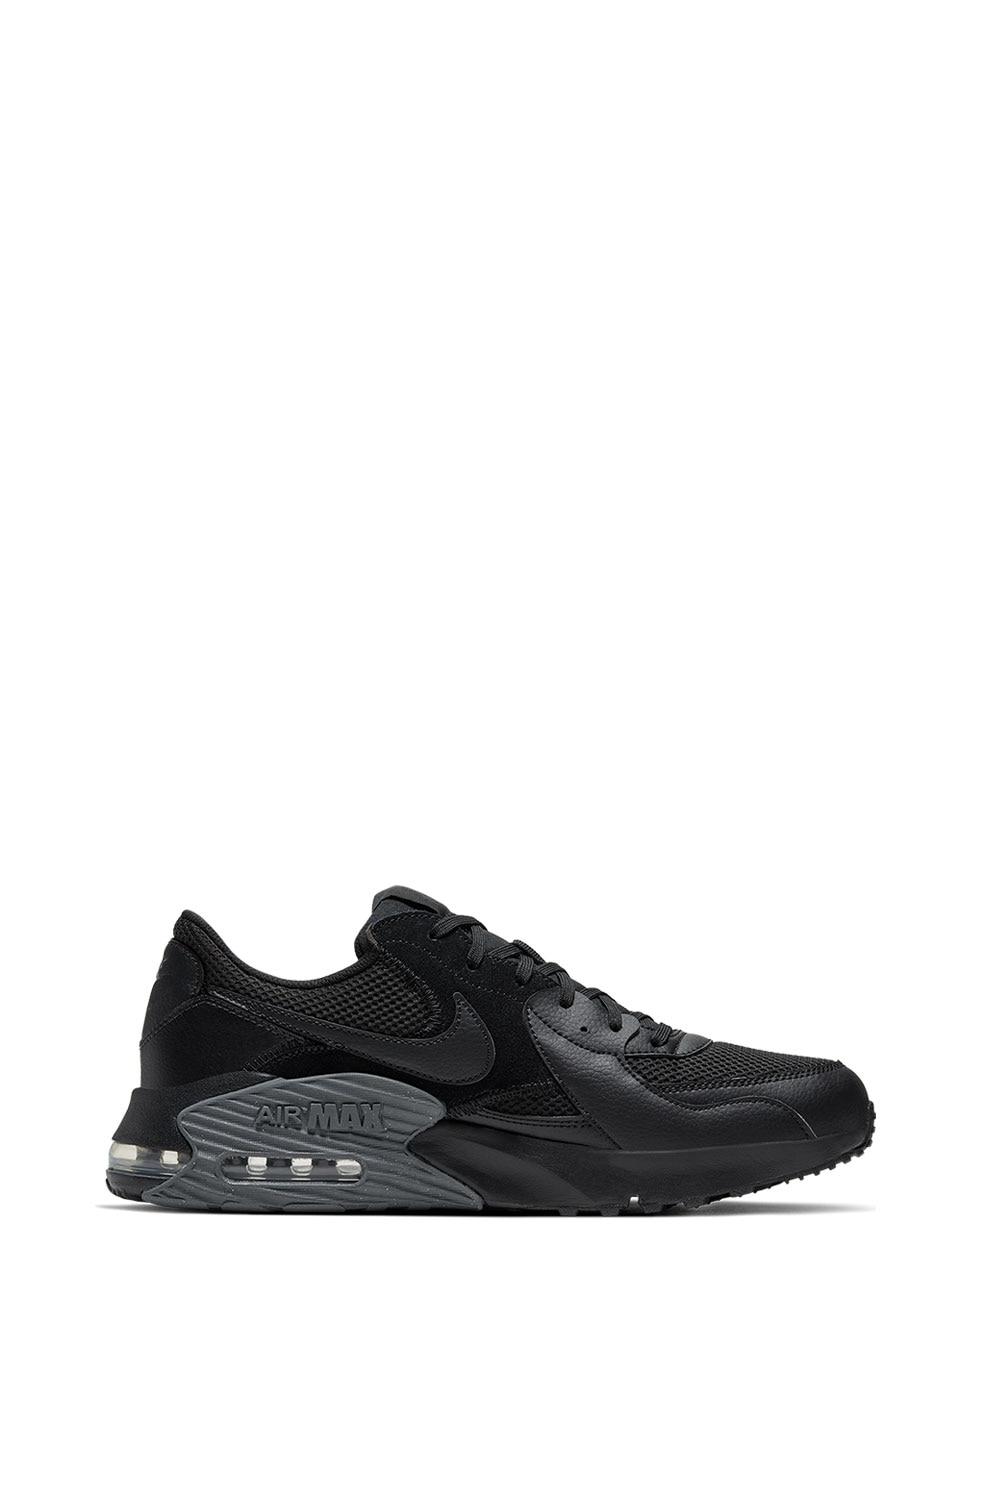 Línea de visión suma Inspeccionar  Nike, Pantofi sport cu garnituri din piele intoarsa Air Max Excee, Negru,  10 - eMAG.ro